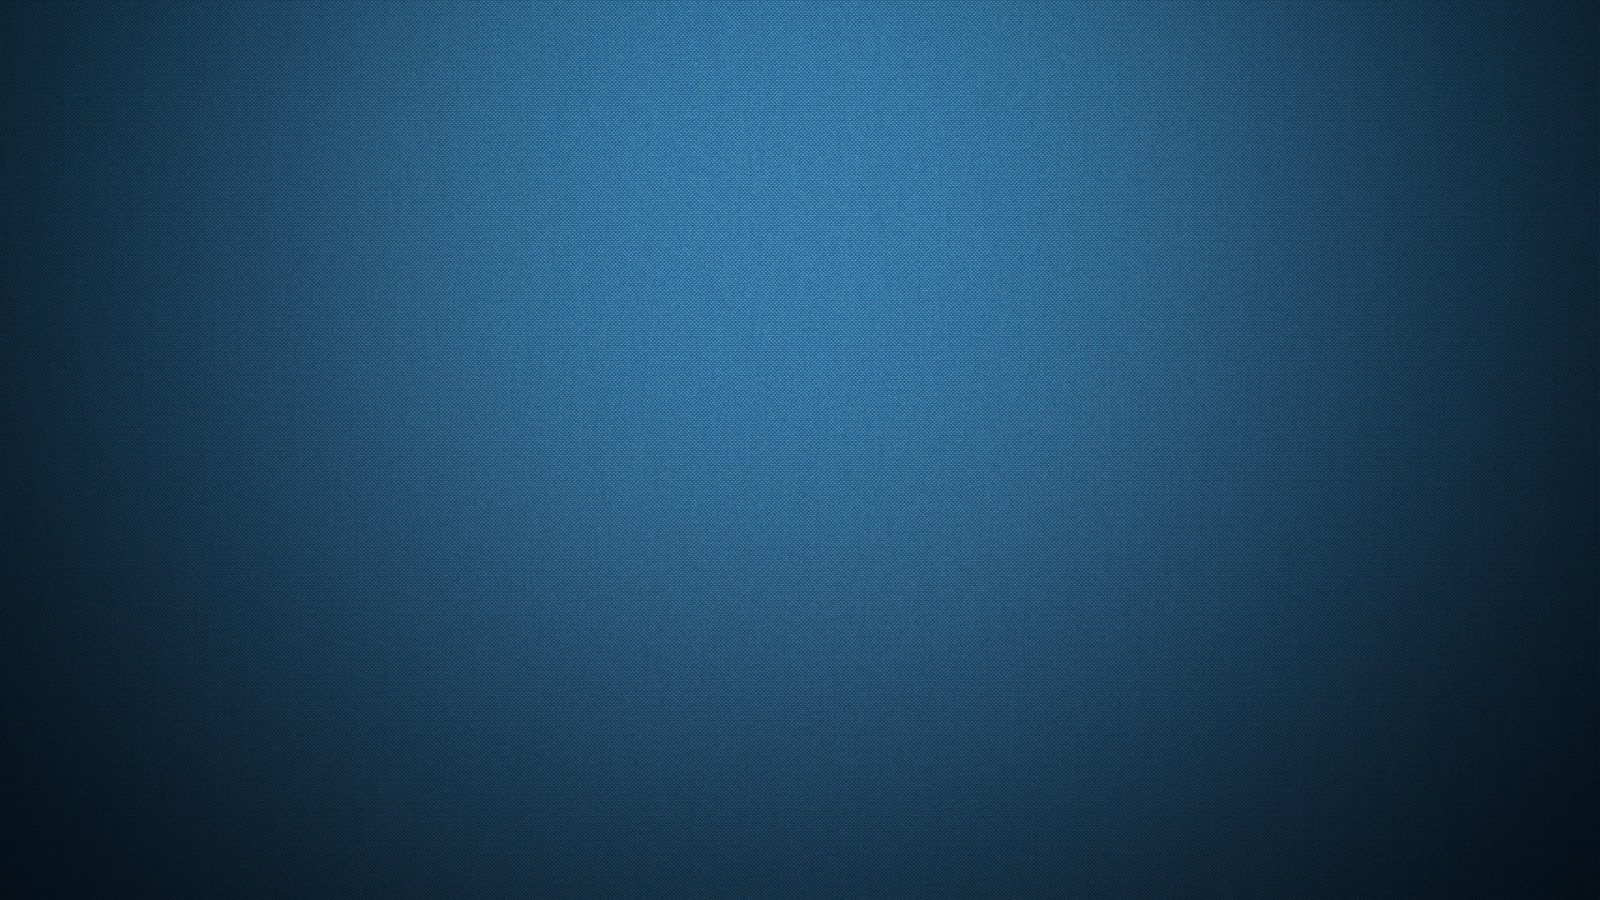 HD wallpapers iphone 5c blue color wallpaper